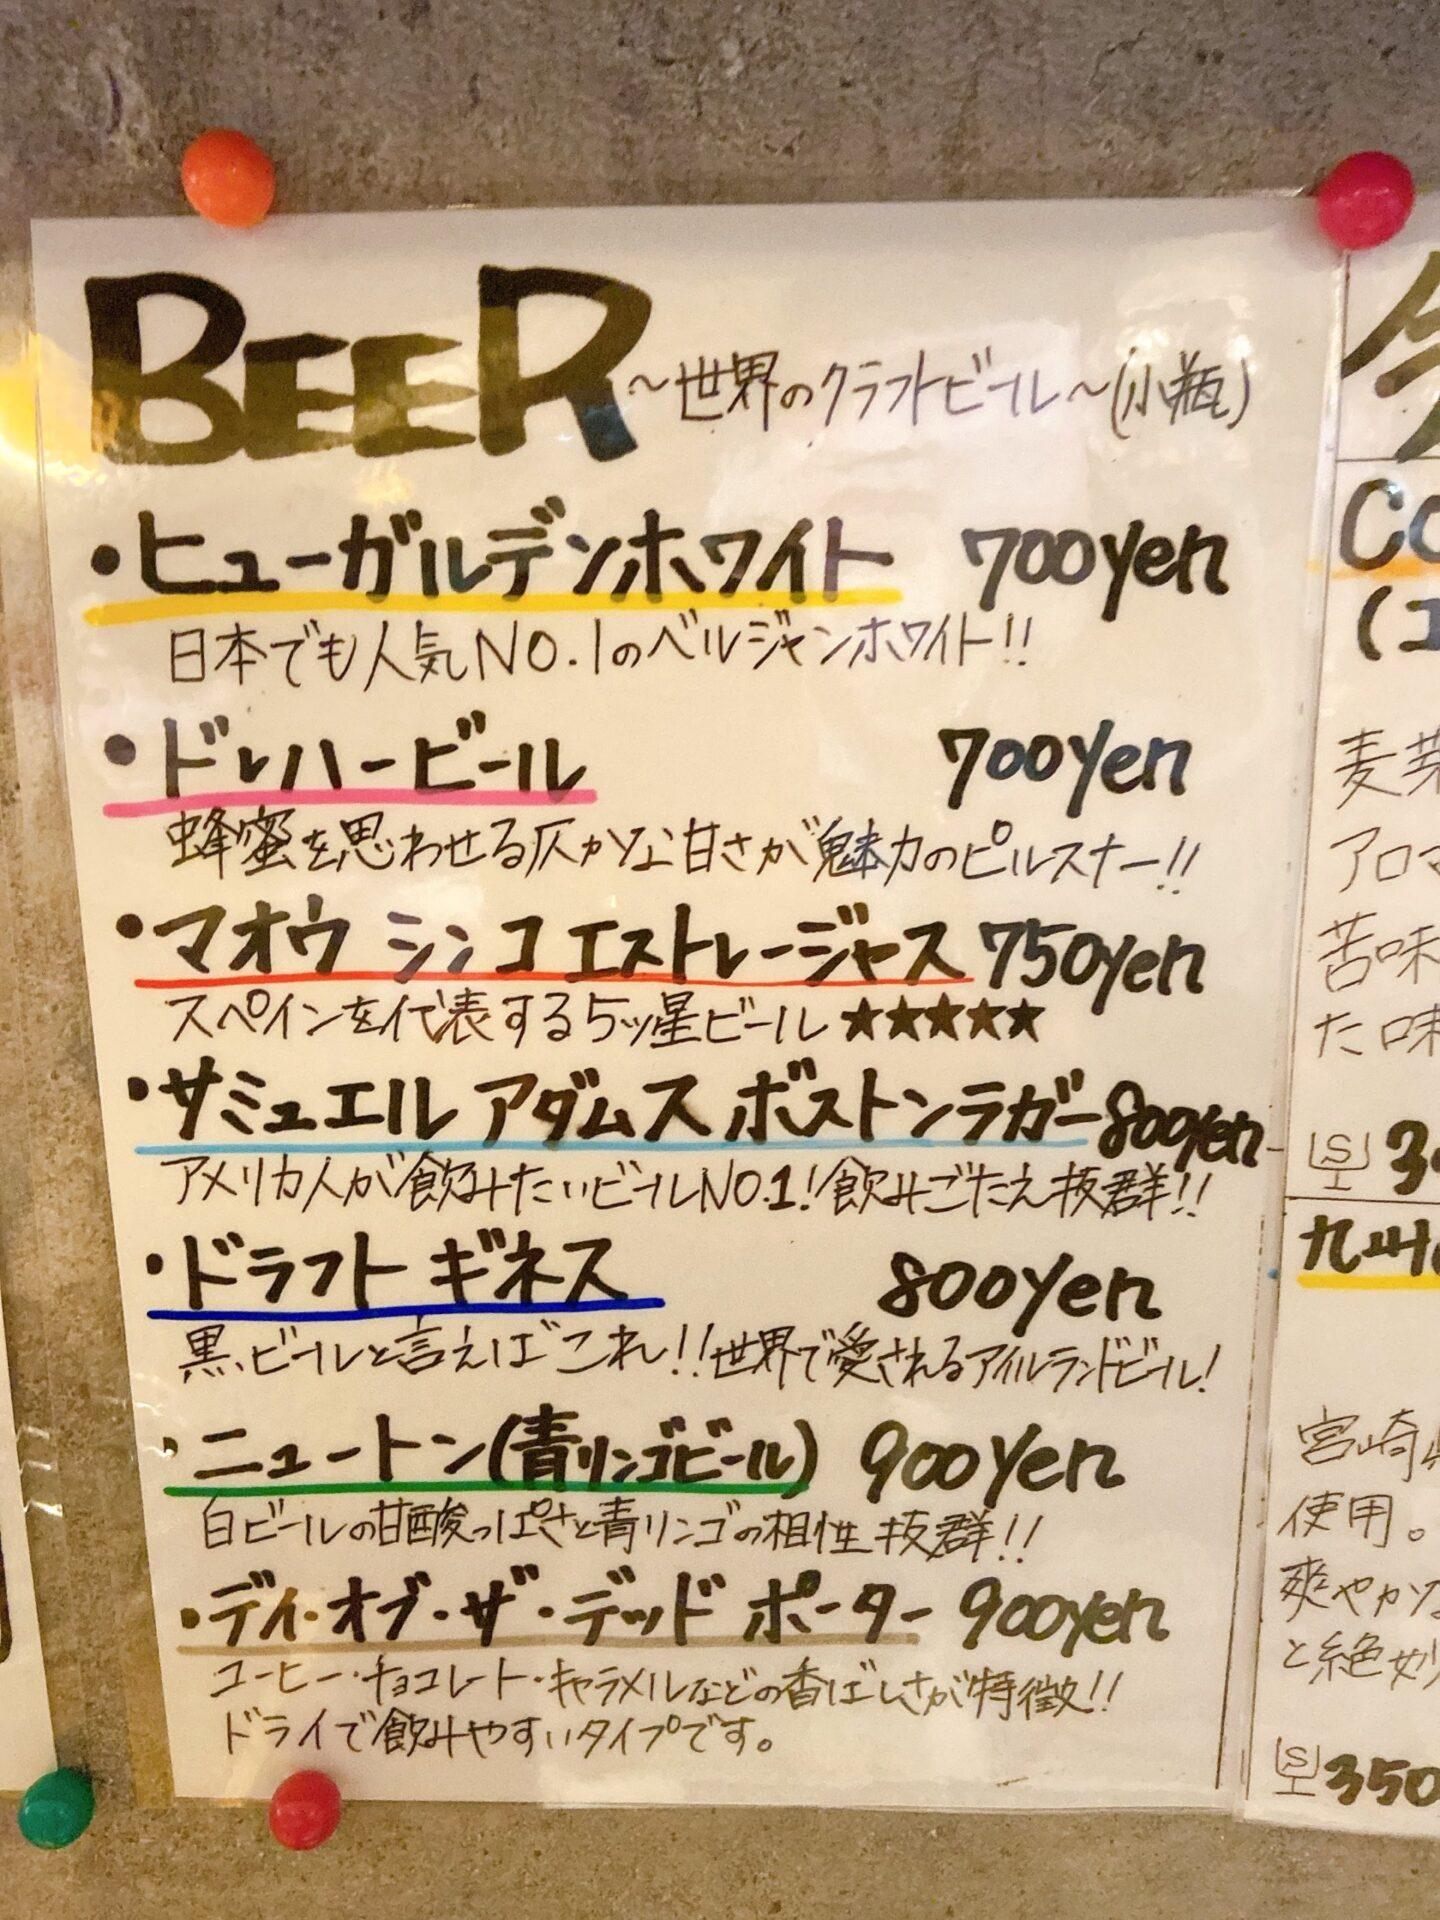 Emisai ビール